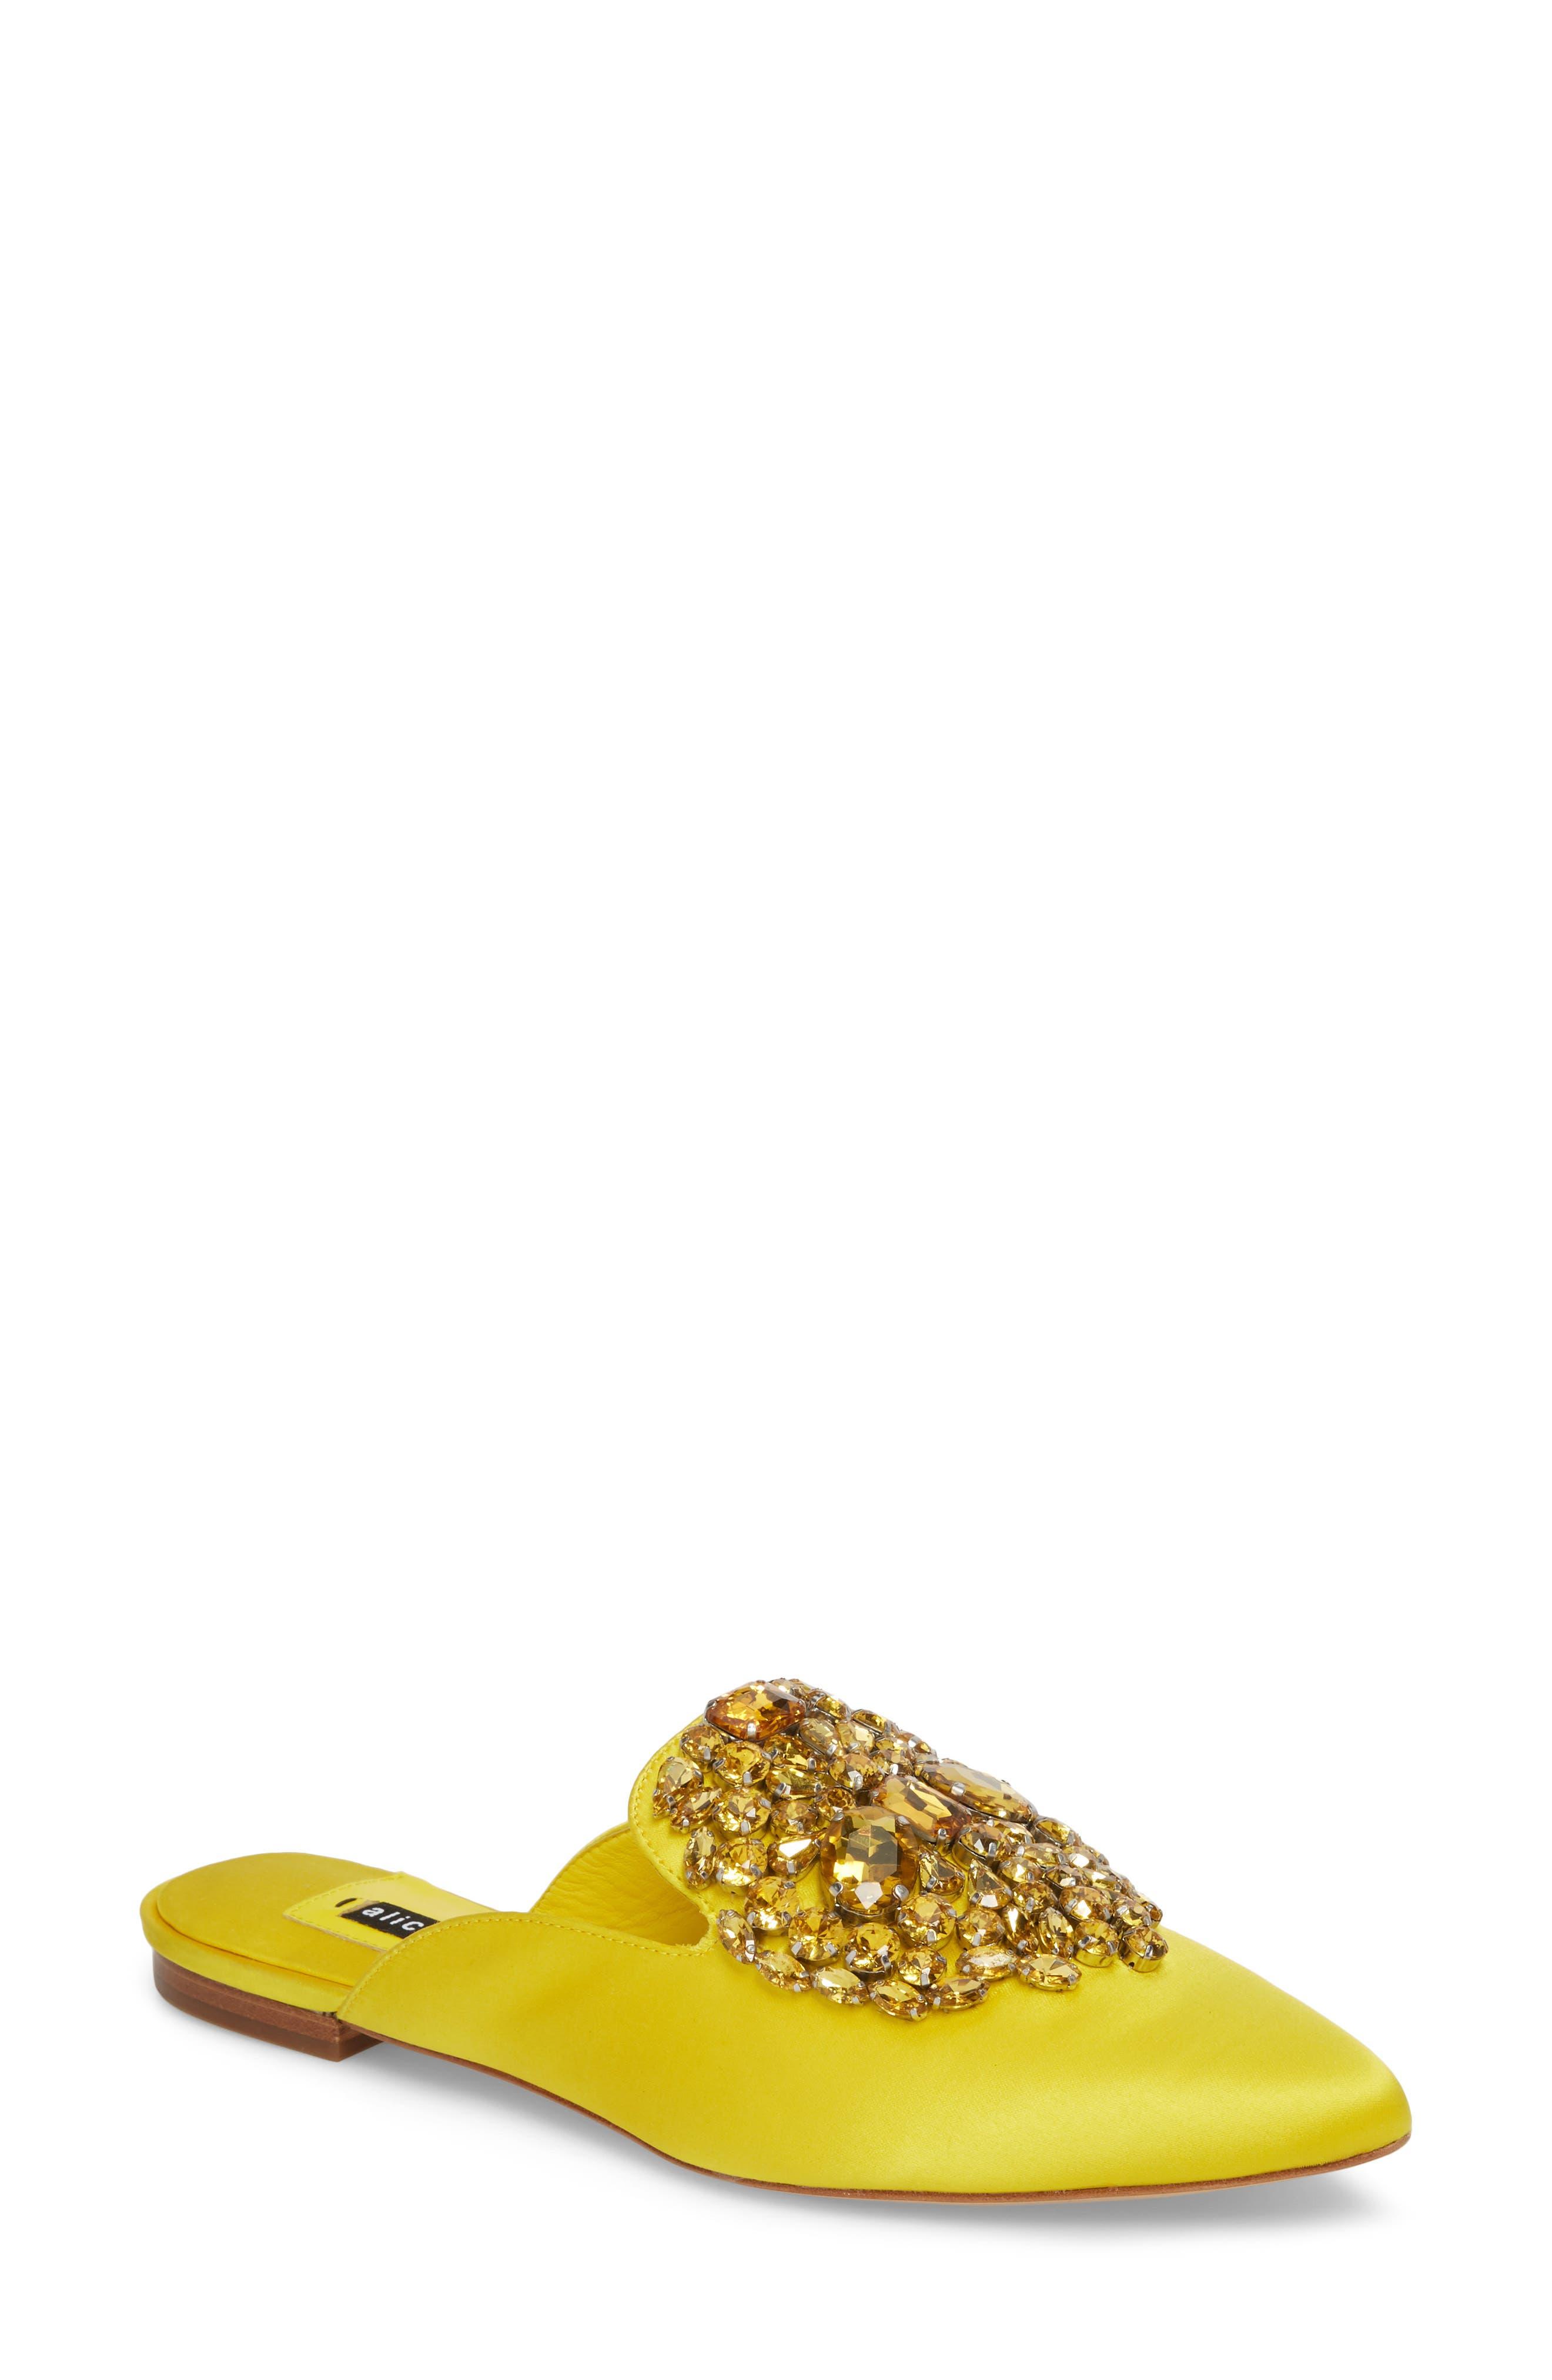 Lilly Crystal Embellished Loafer Mule,                             Main thumbnail 1, color,                             Dandelion